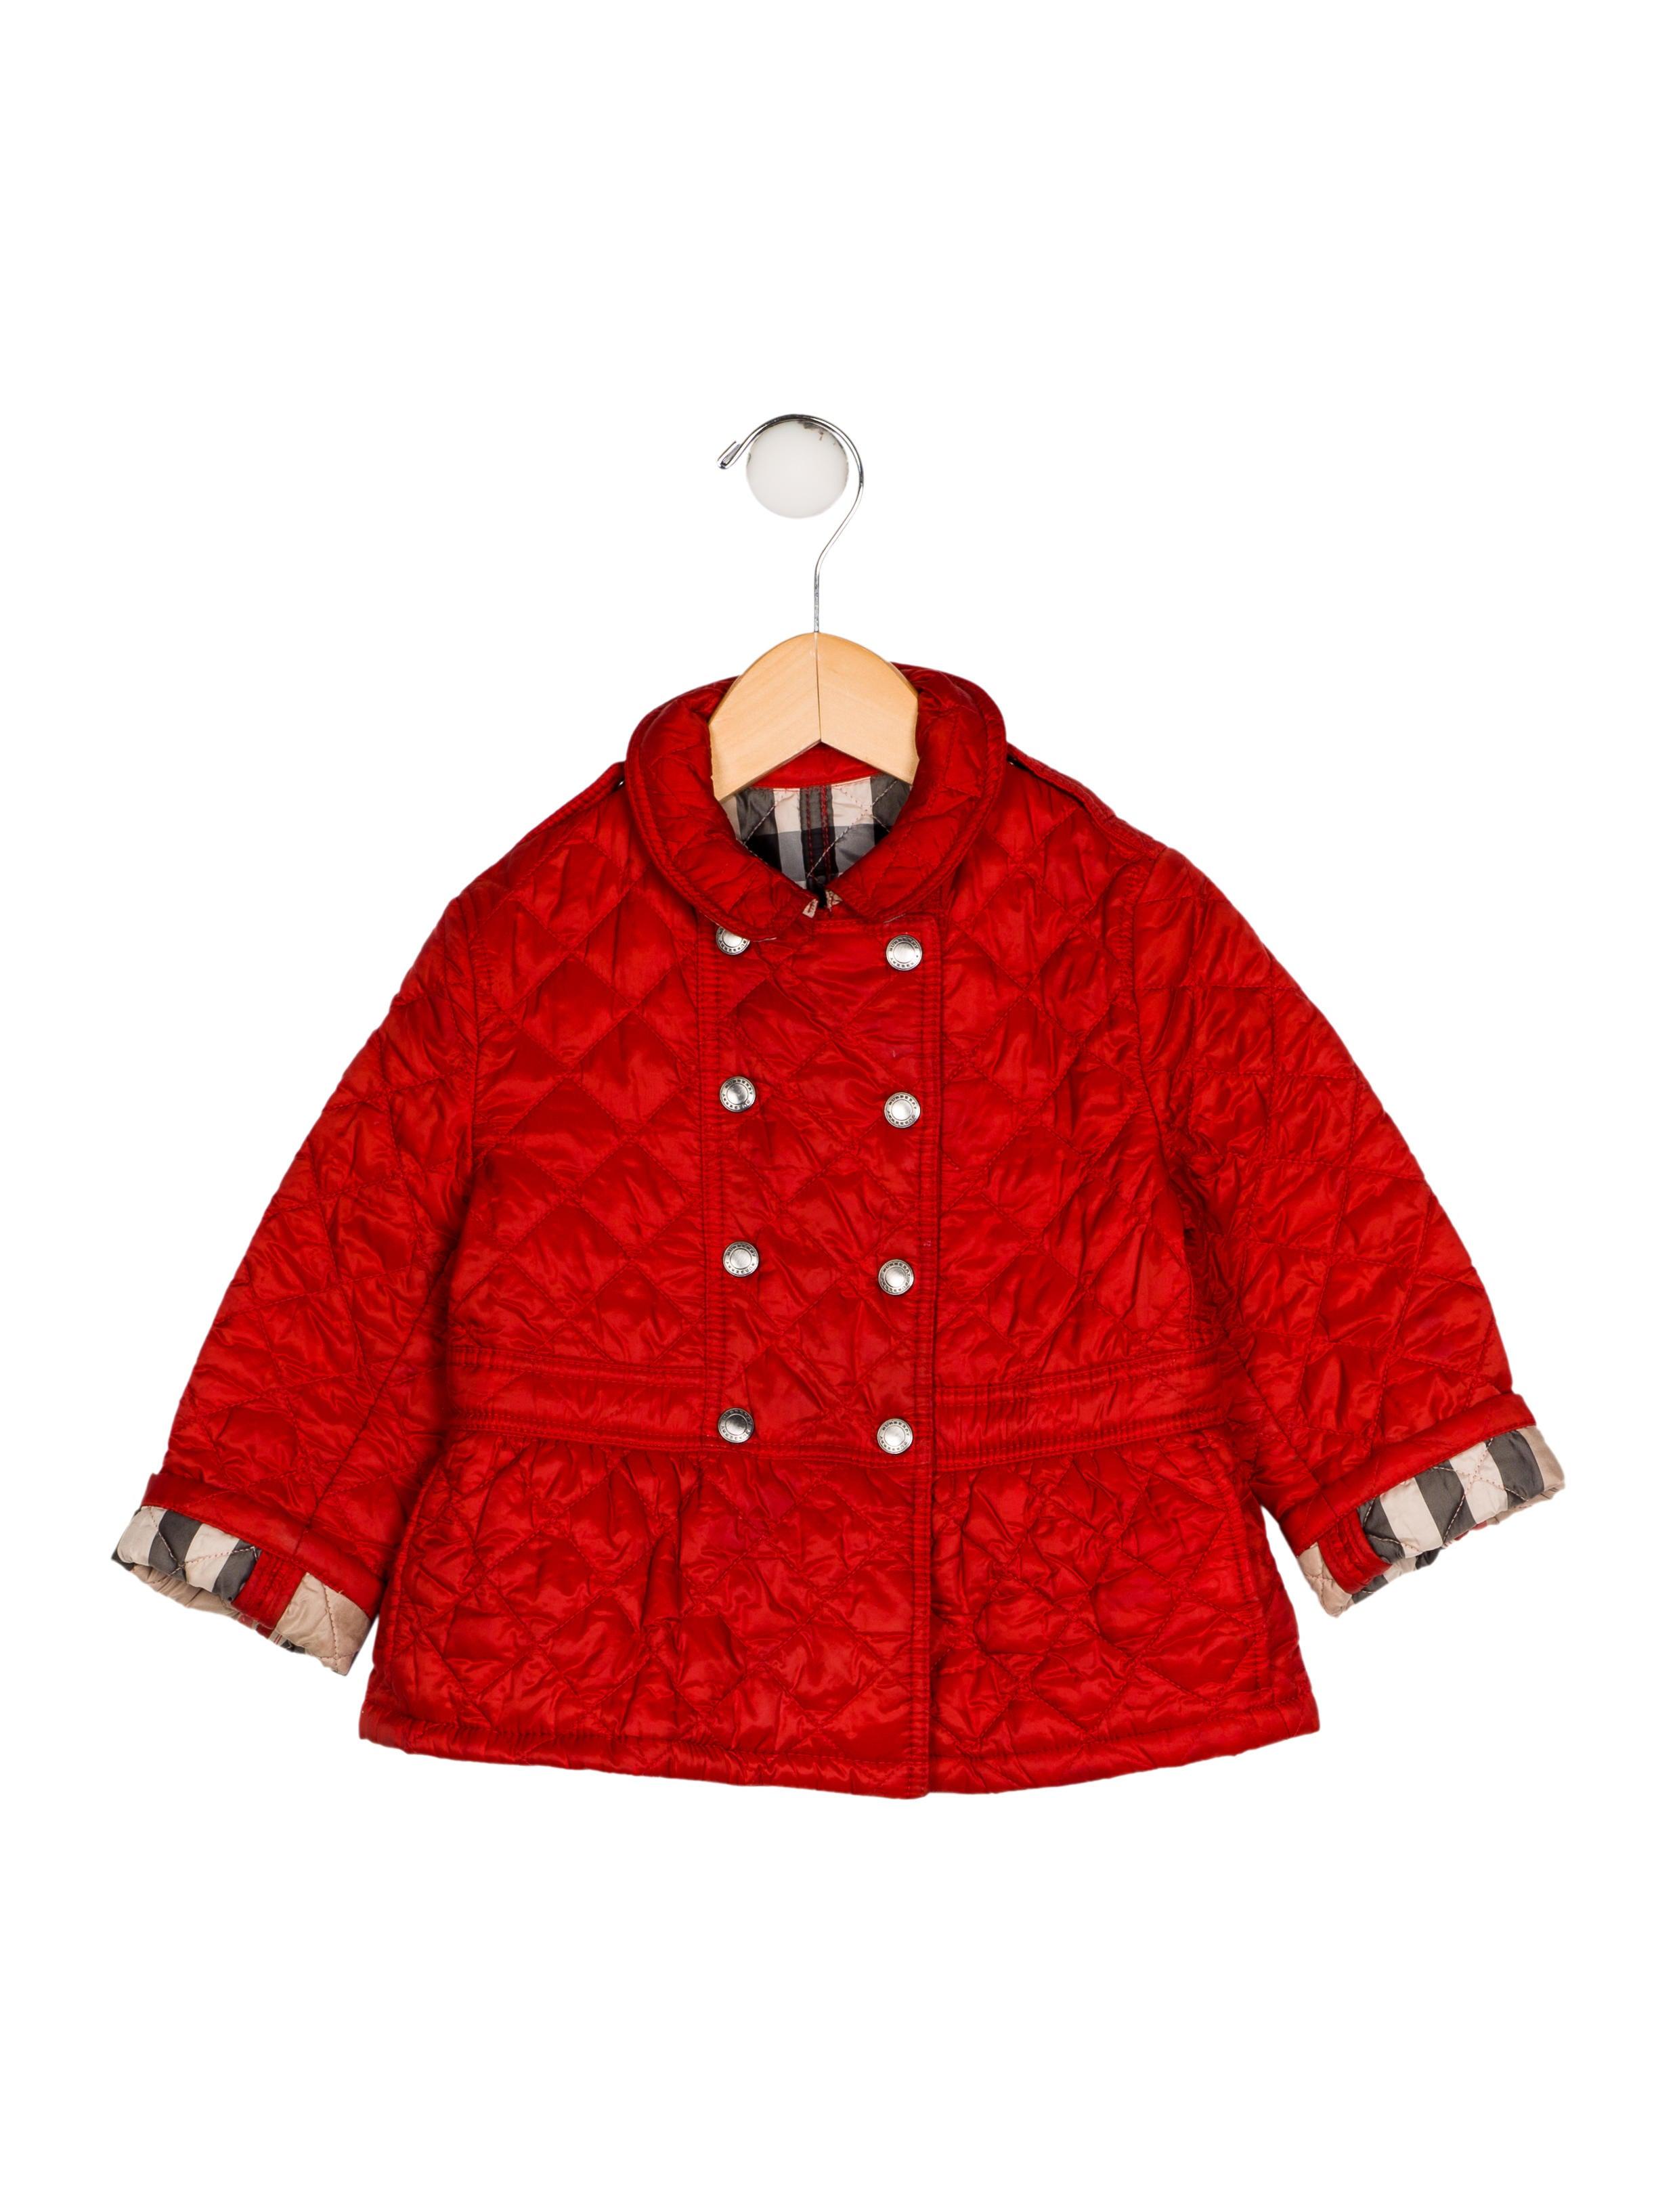 0fa990748919 Burberry Girls  Quilted Lightweight Coat - Girls - BUR92123